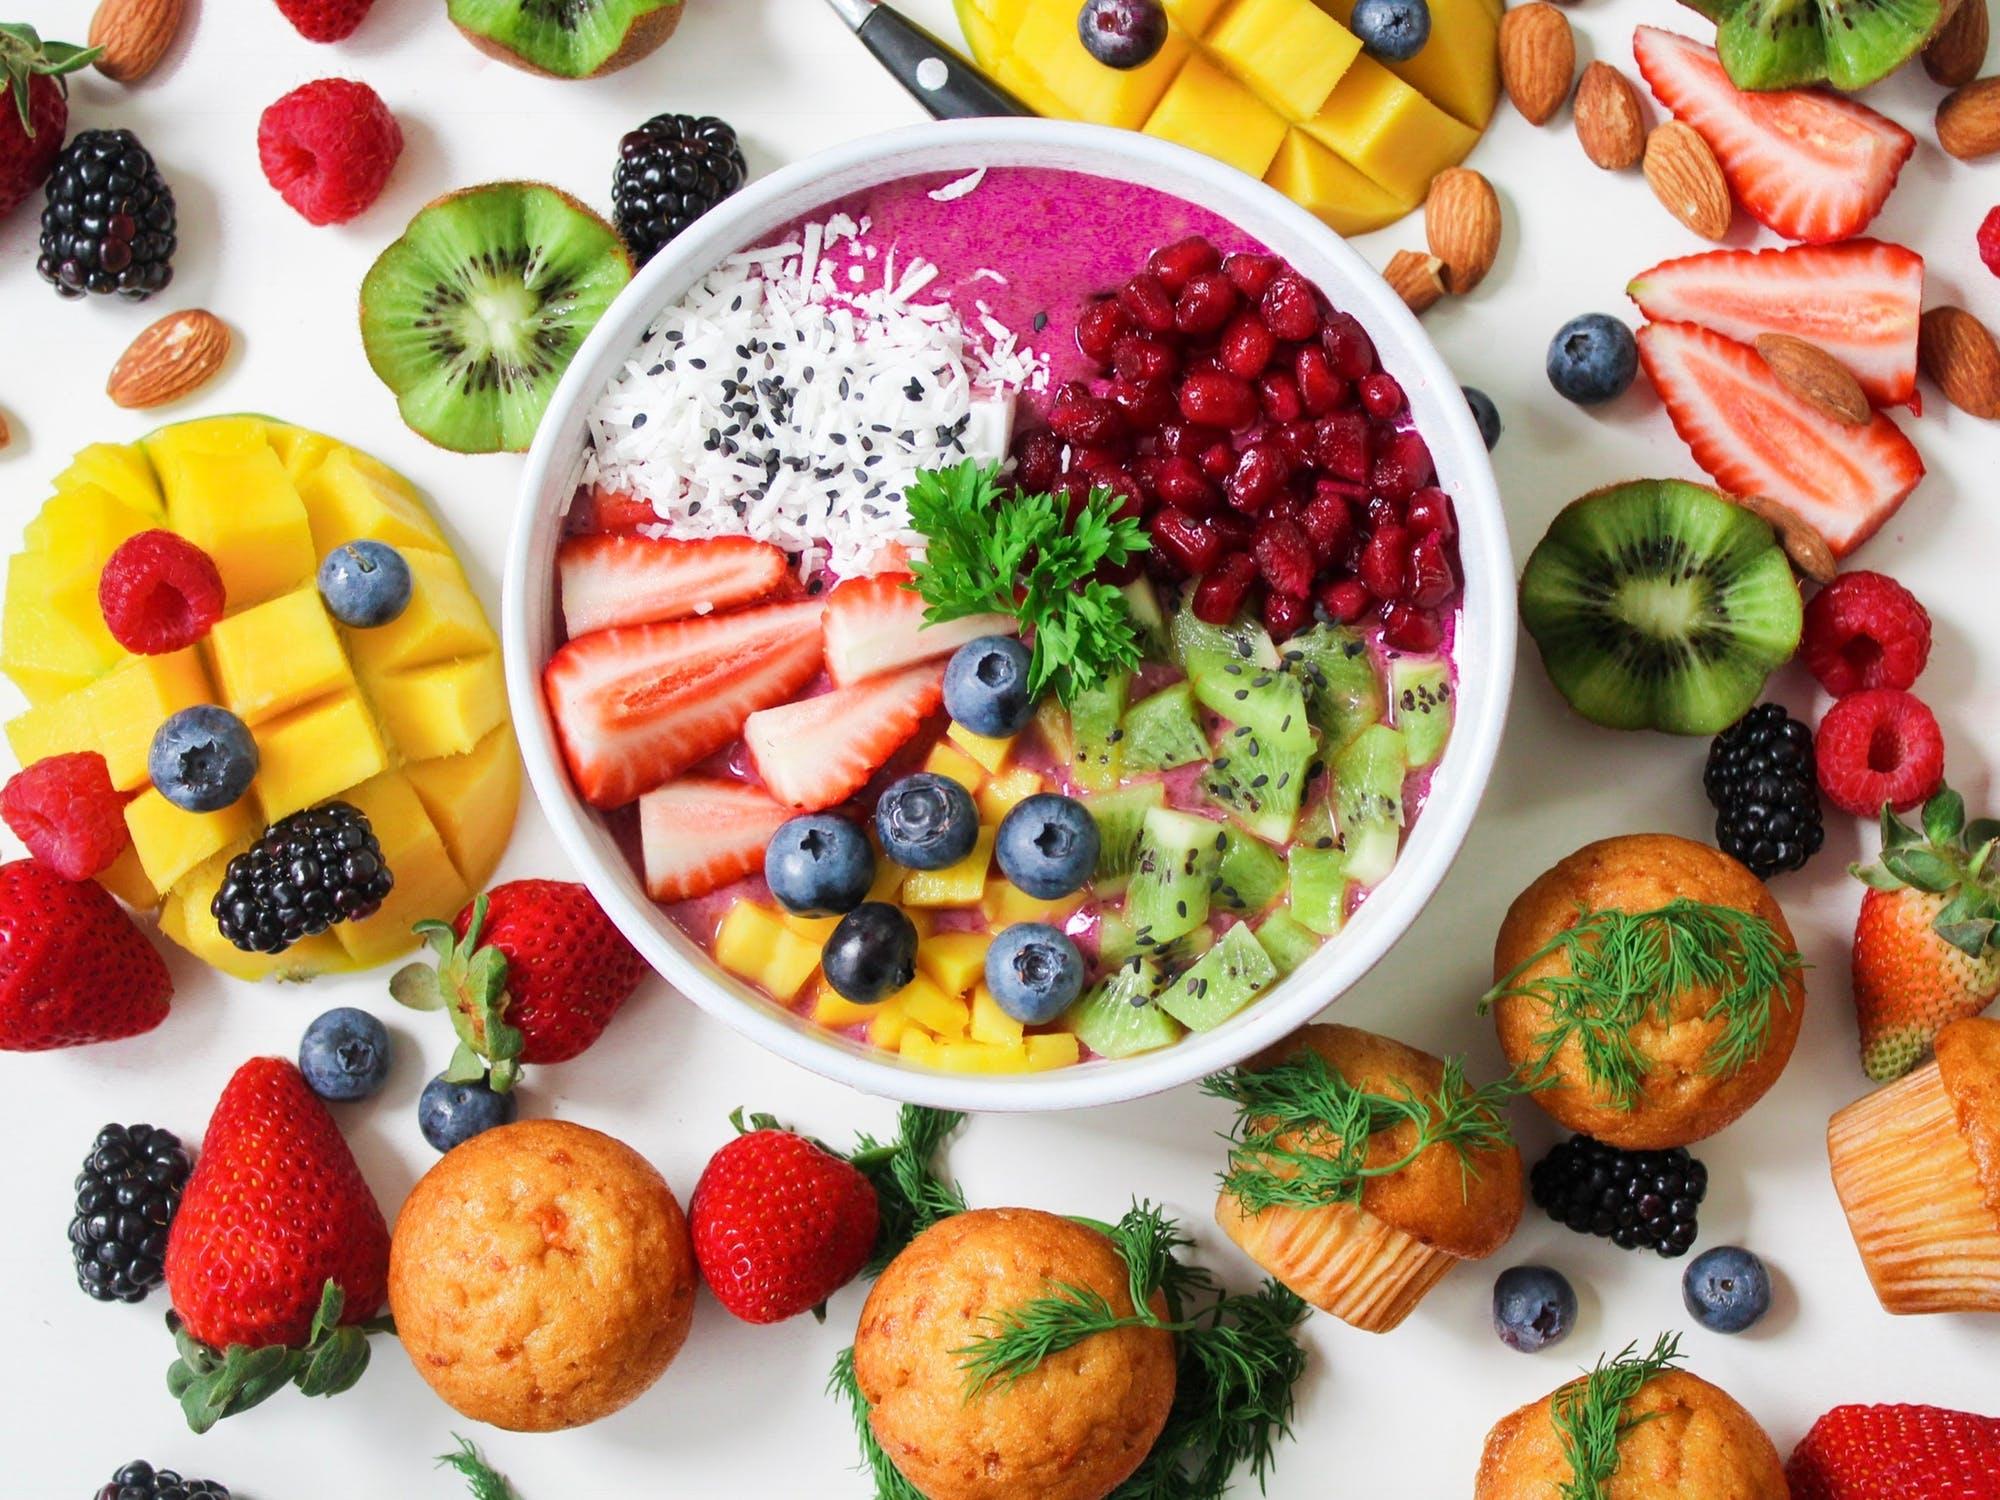 En masse sund mad samlet